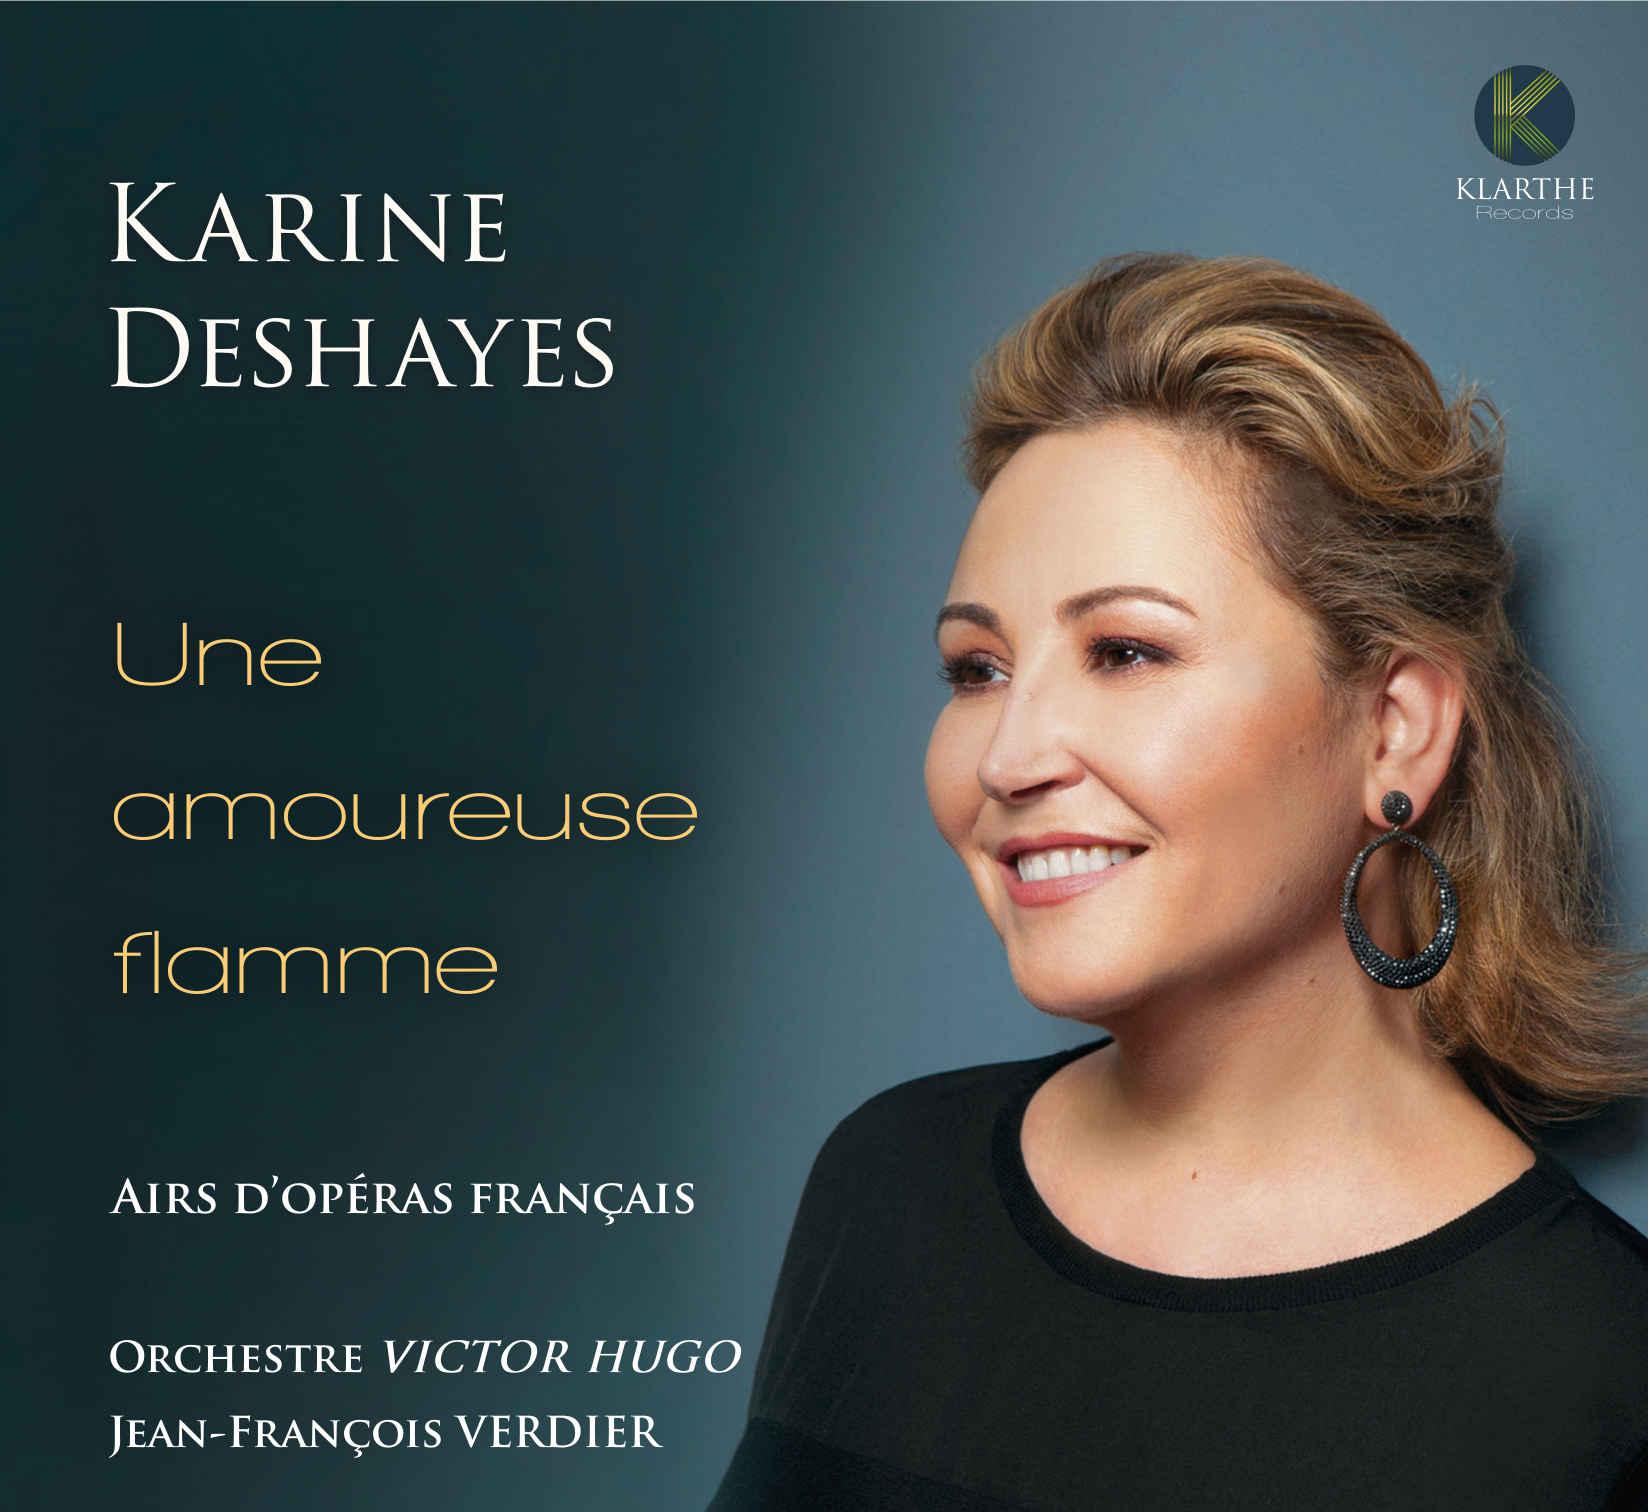 Karine Deshayes KLA064couv_low